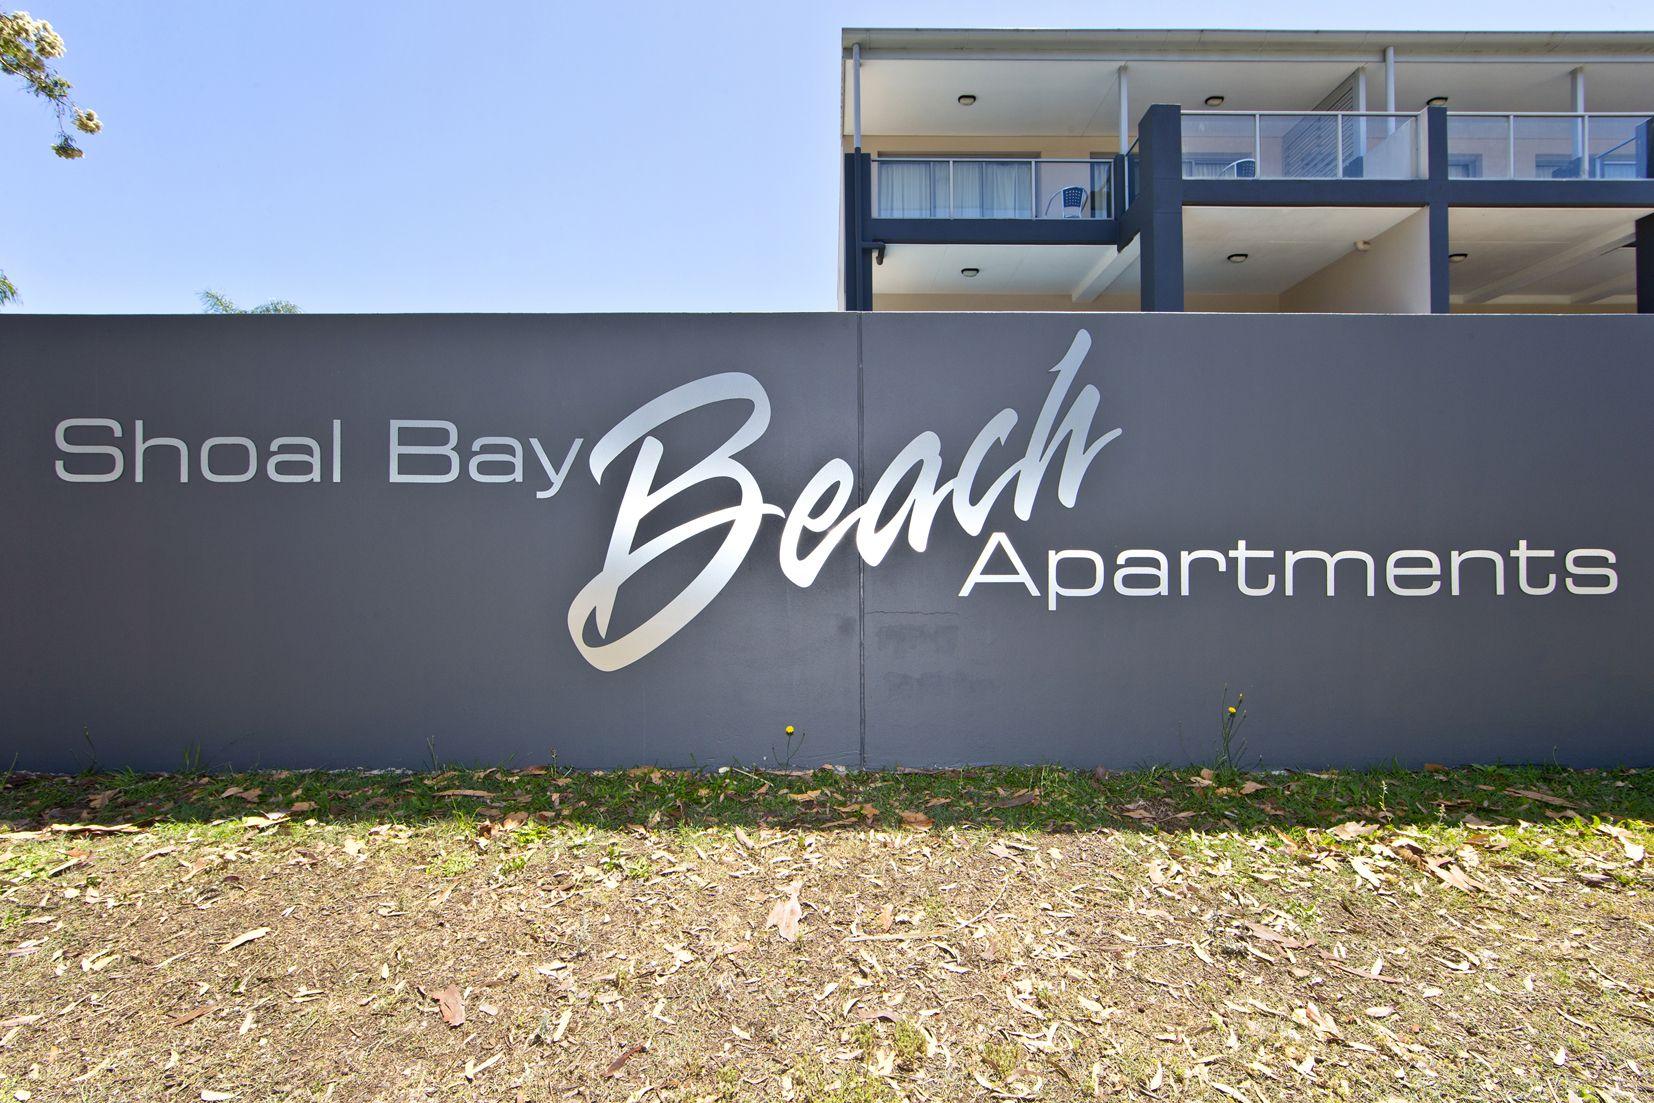 20/2 Shoal Bay Road, Nelson Bay